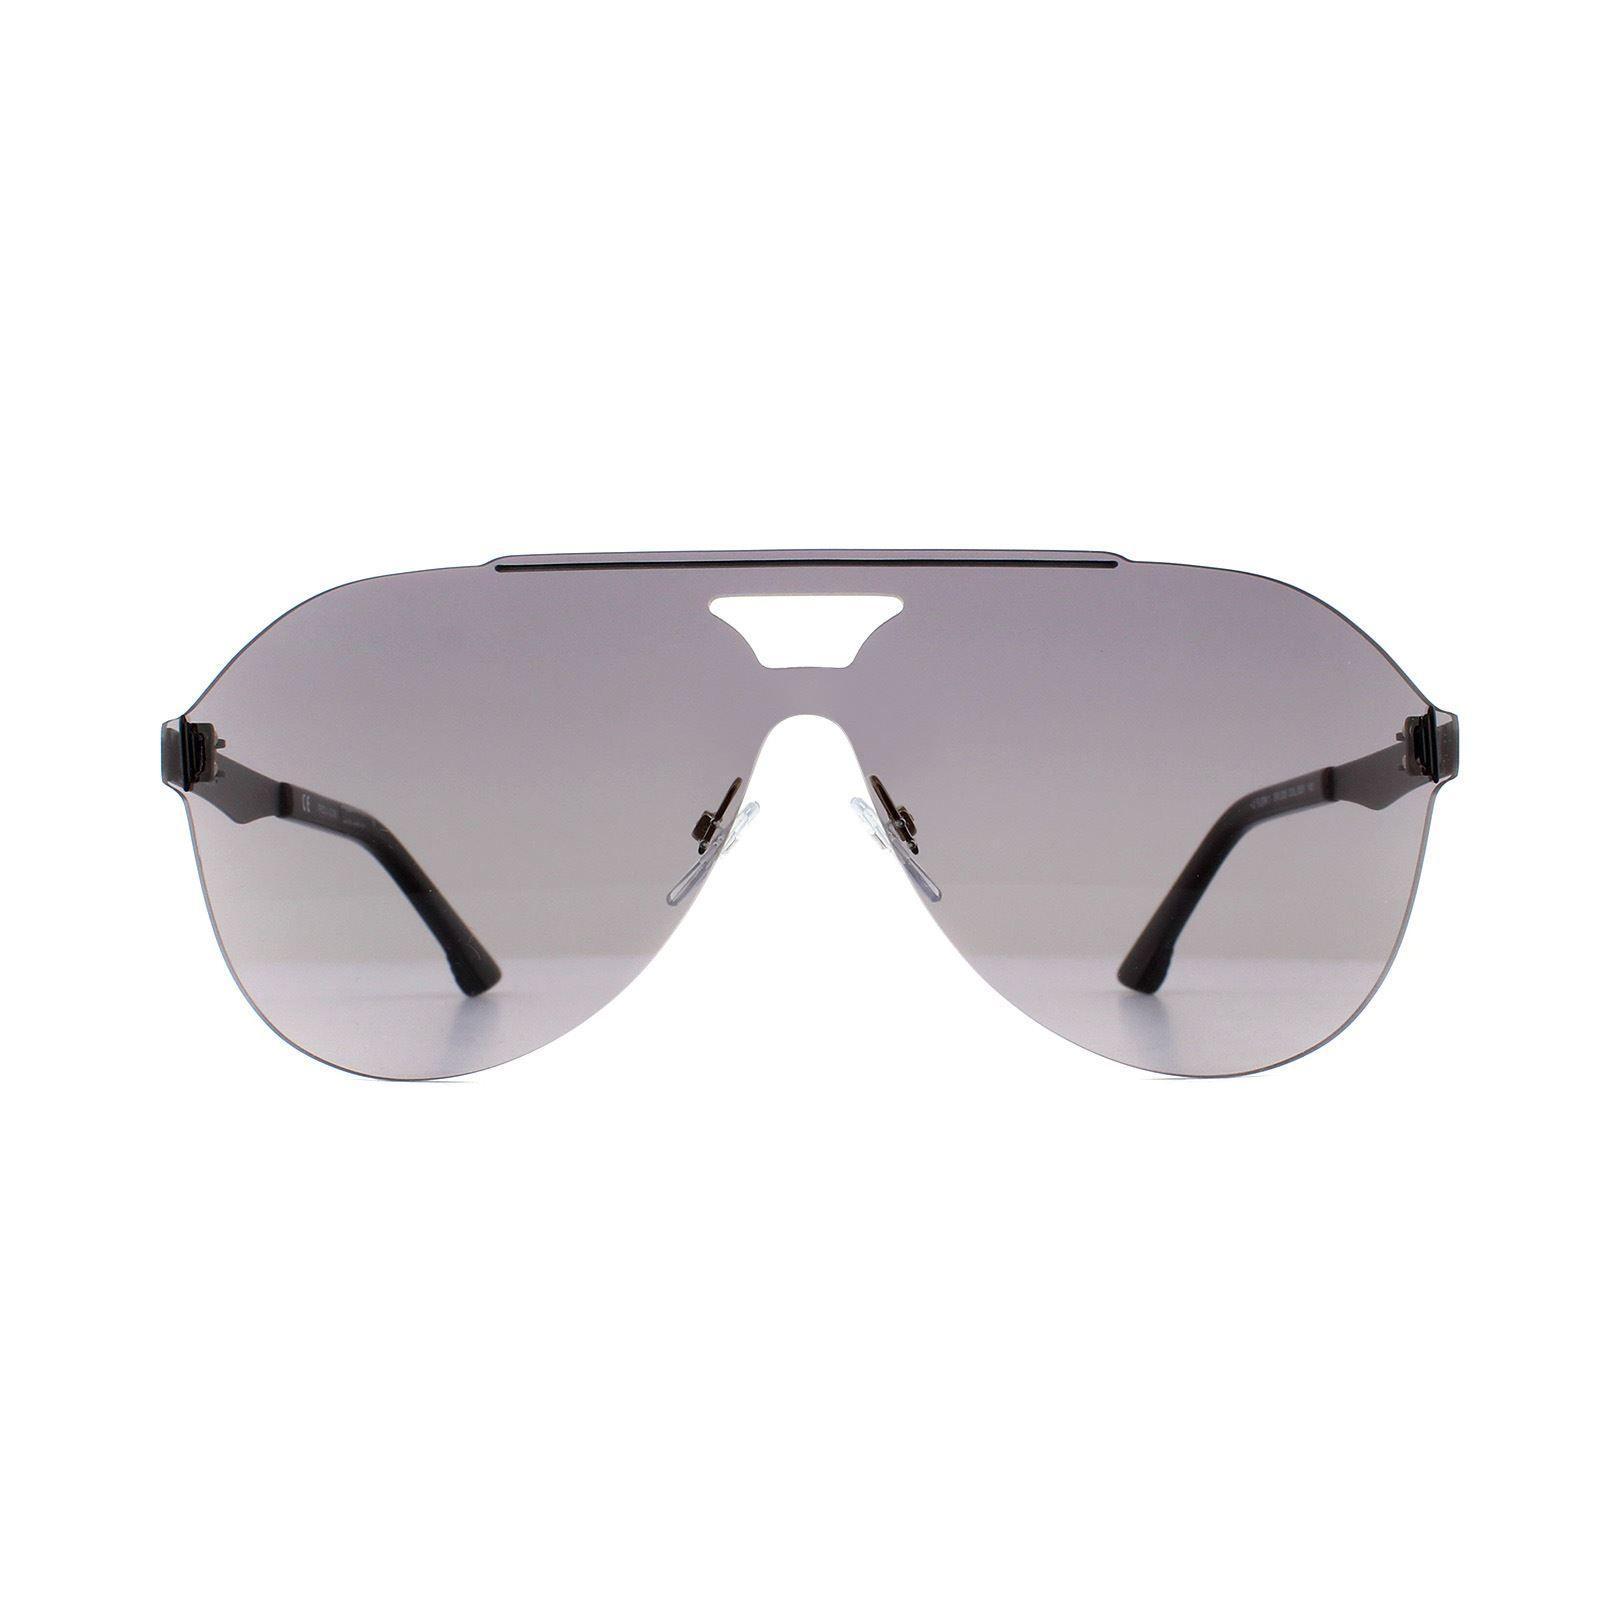 Police Sunglasses SPL339 Flow 1 0531 Matte Black Smoke Grey Gradient